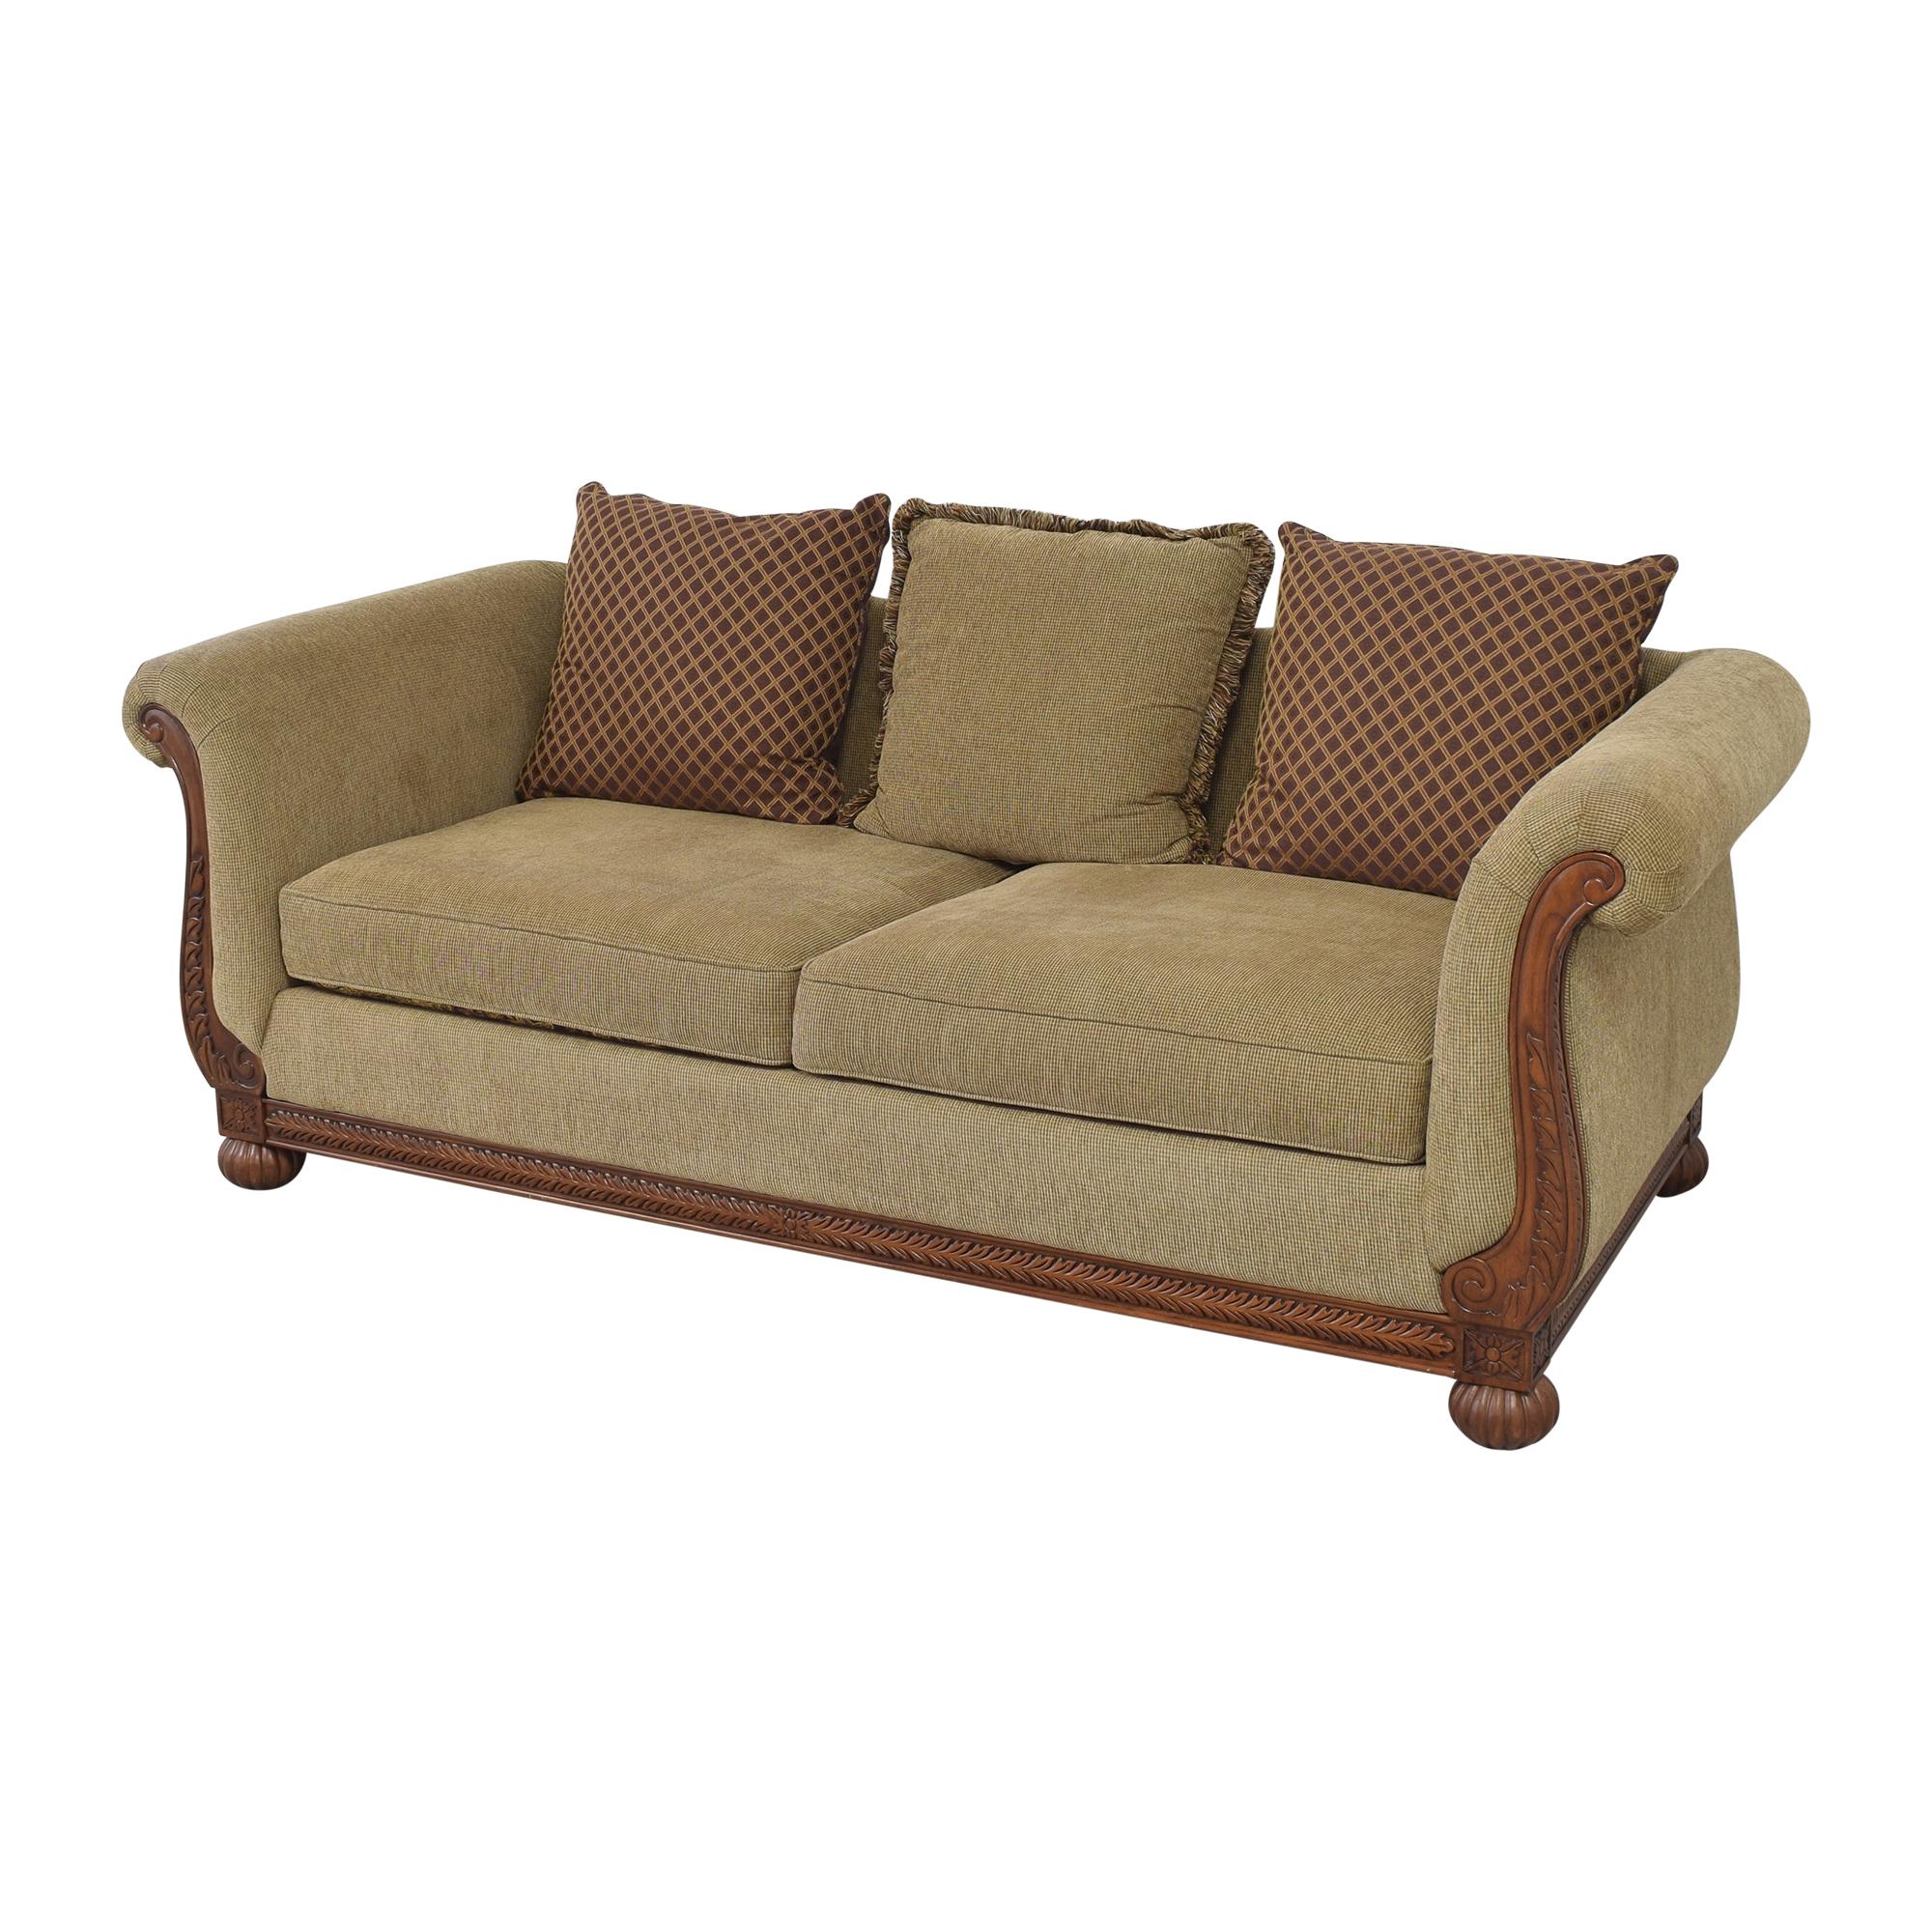 shop HM Richards Furniture HM Richards Furniture Traditional Roll Arm Sofa online